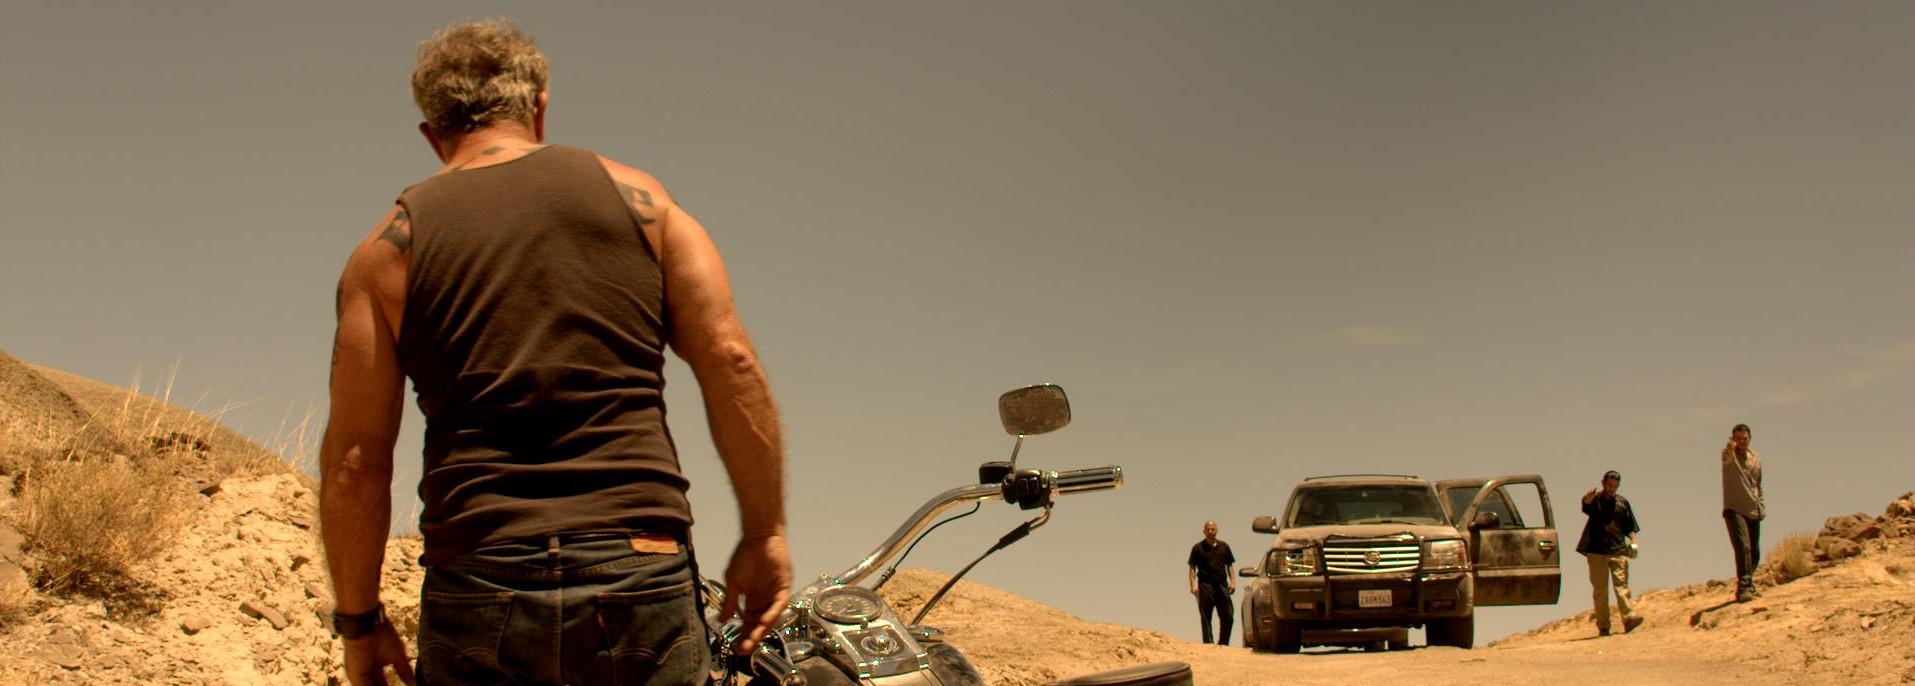 image Official short teaser trailer of august and dredd